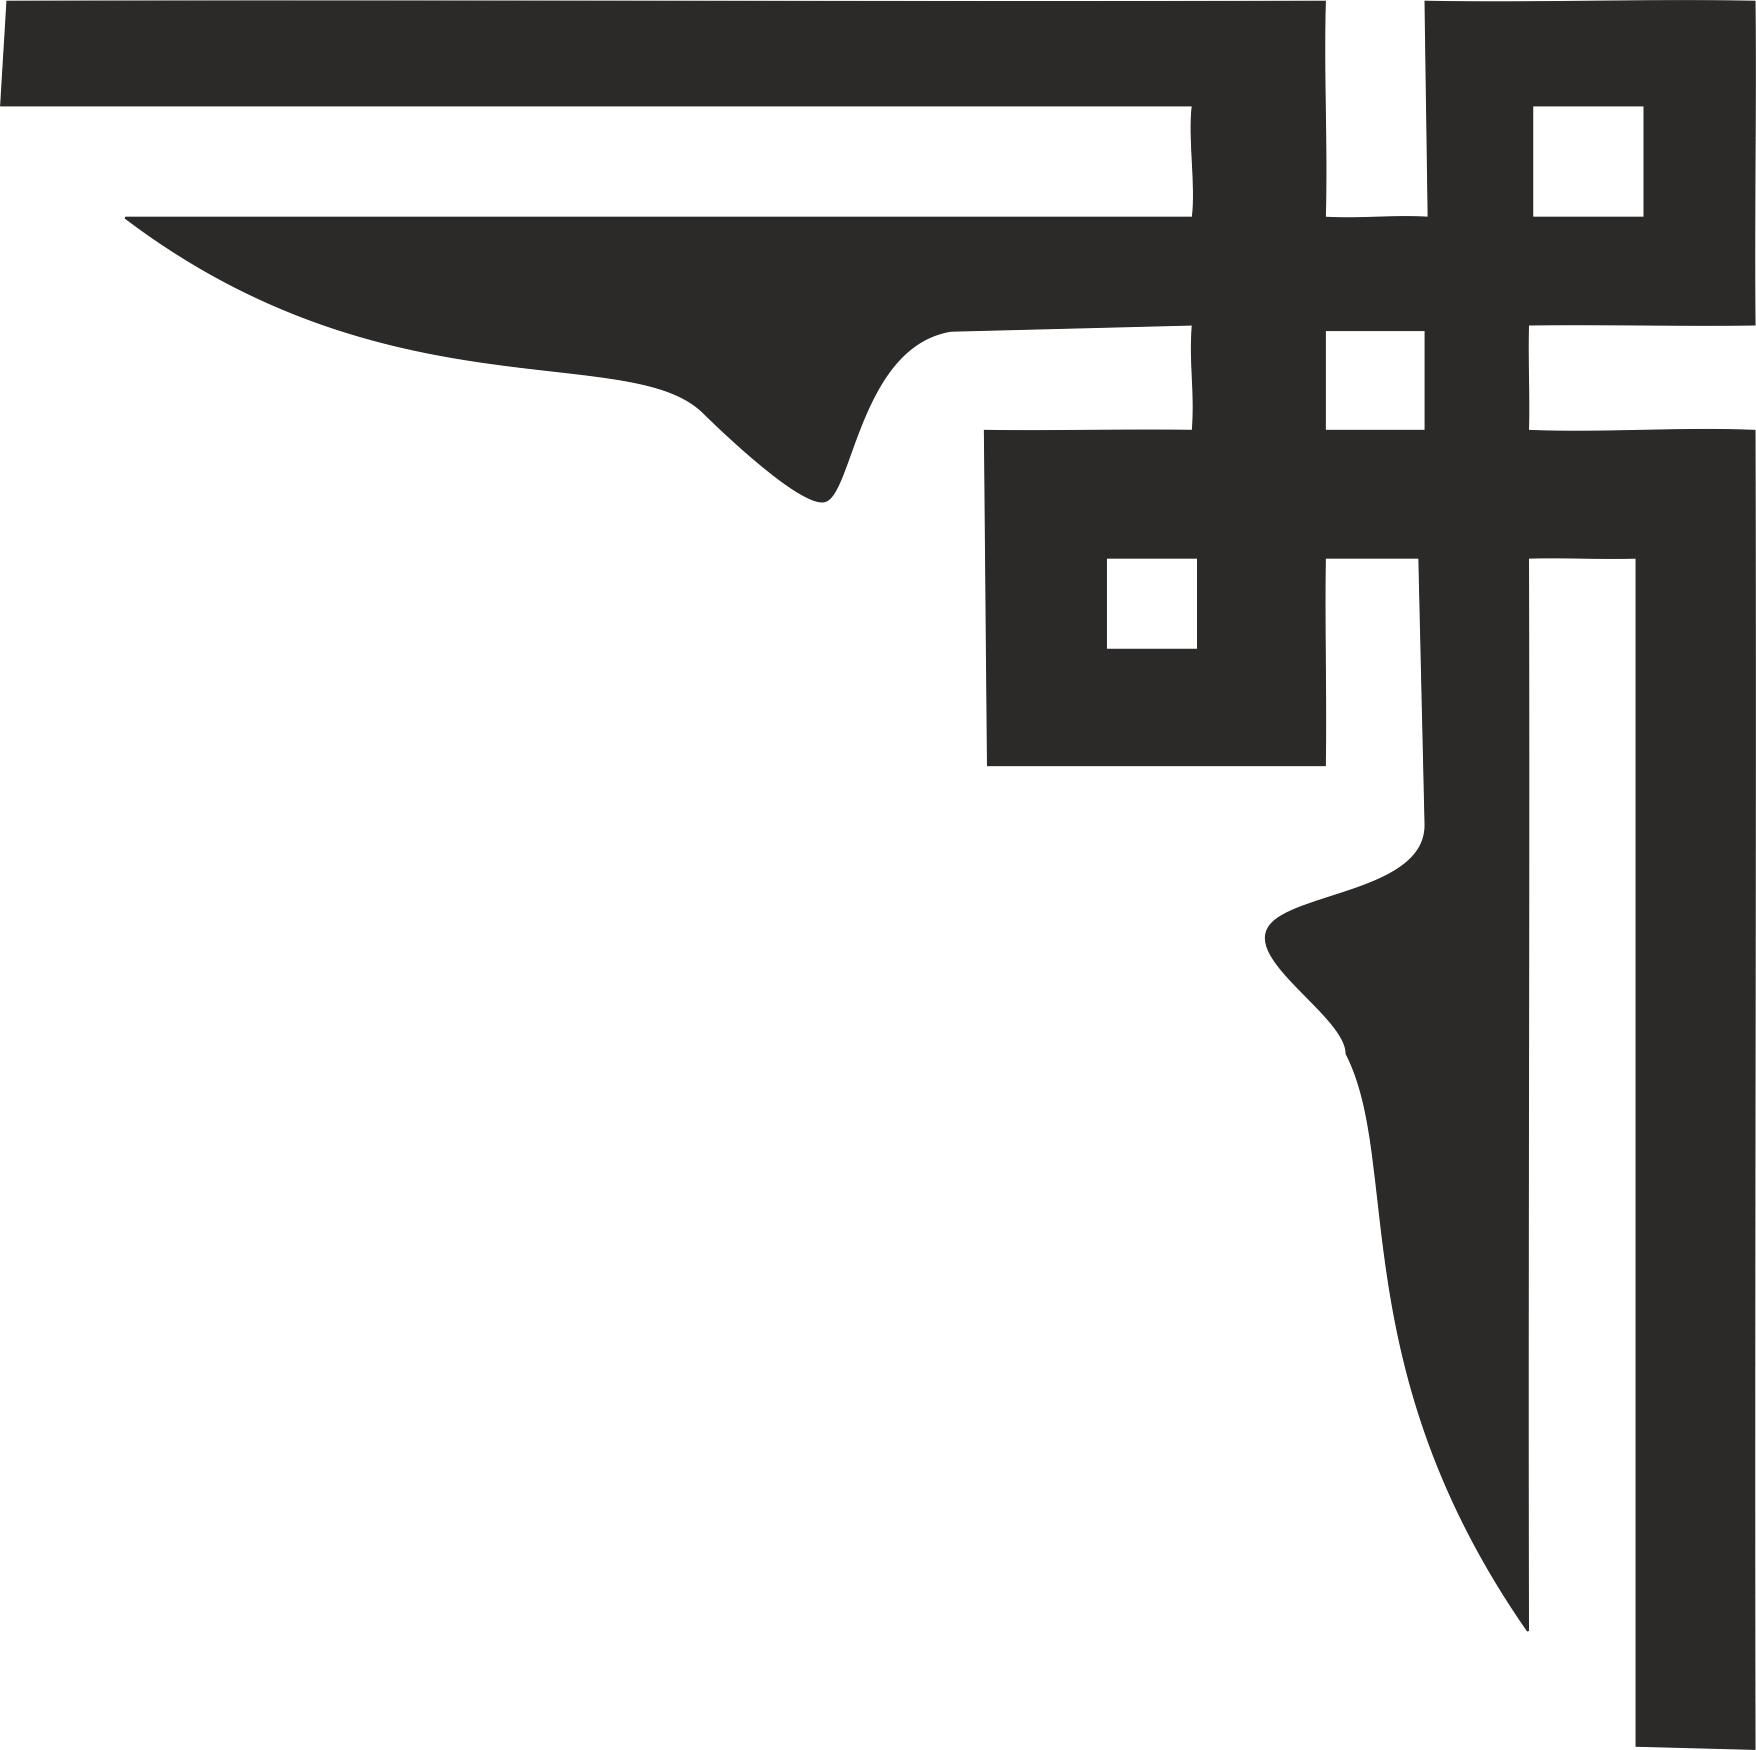 Corner Pattern Design dxf File Free Download